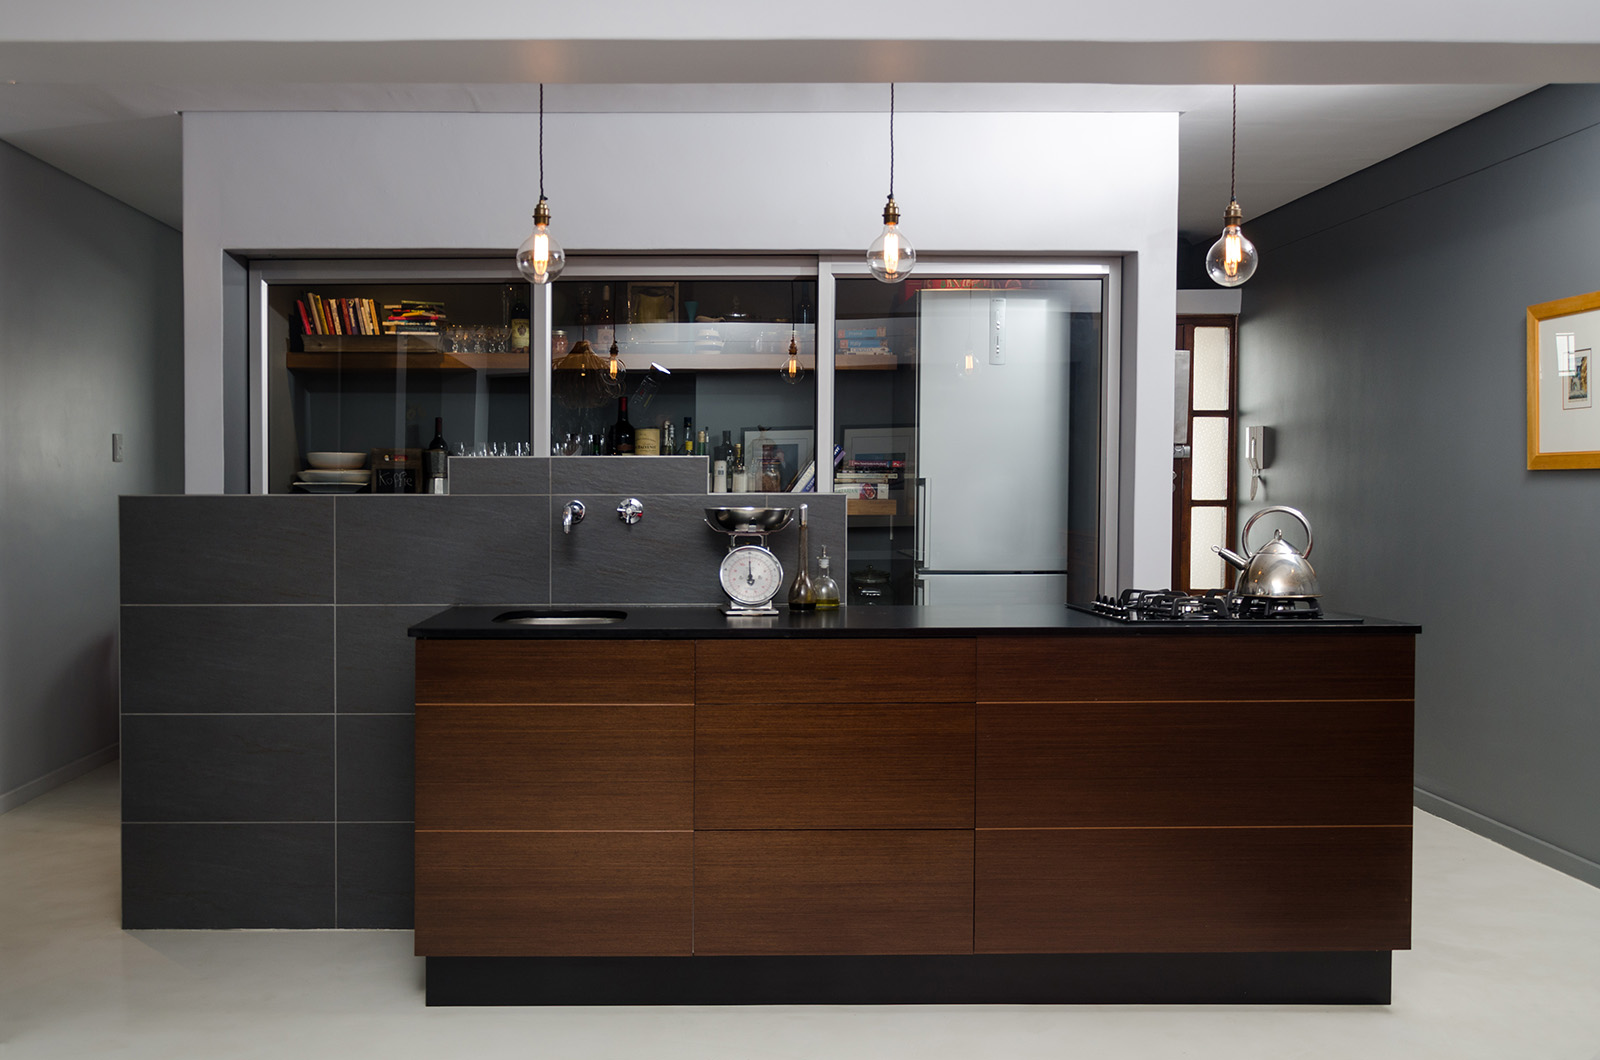 Greenpoint apartment - kitchen2.jpg